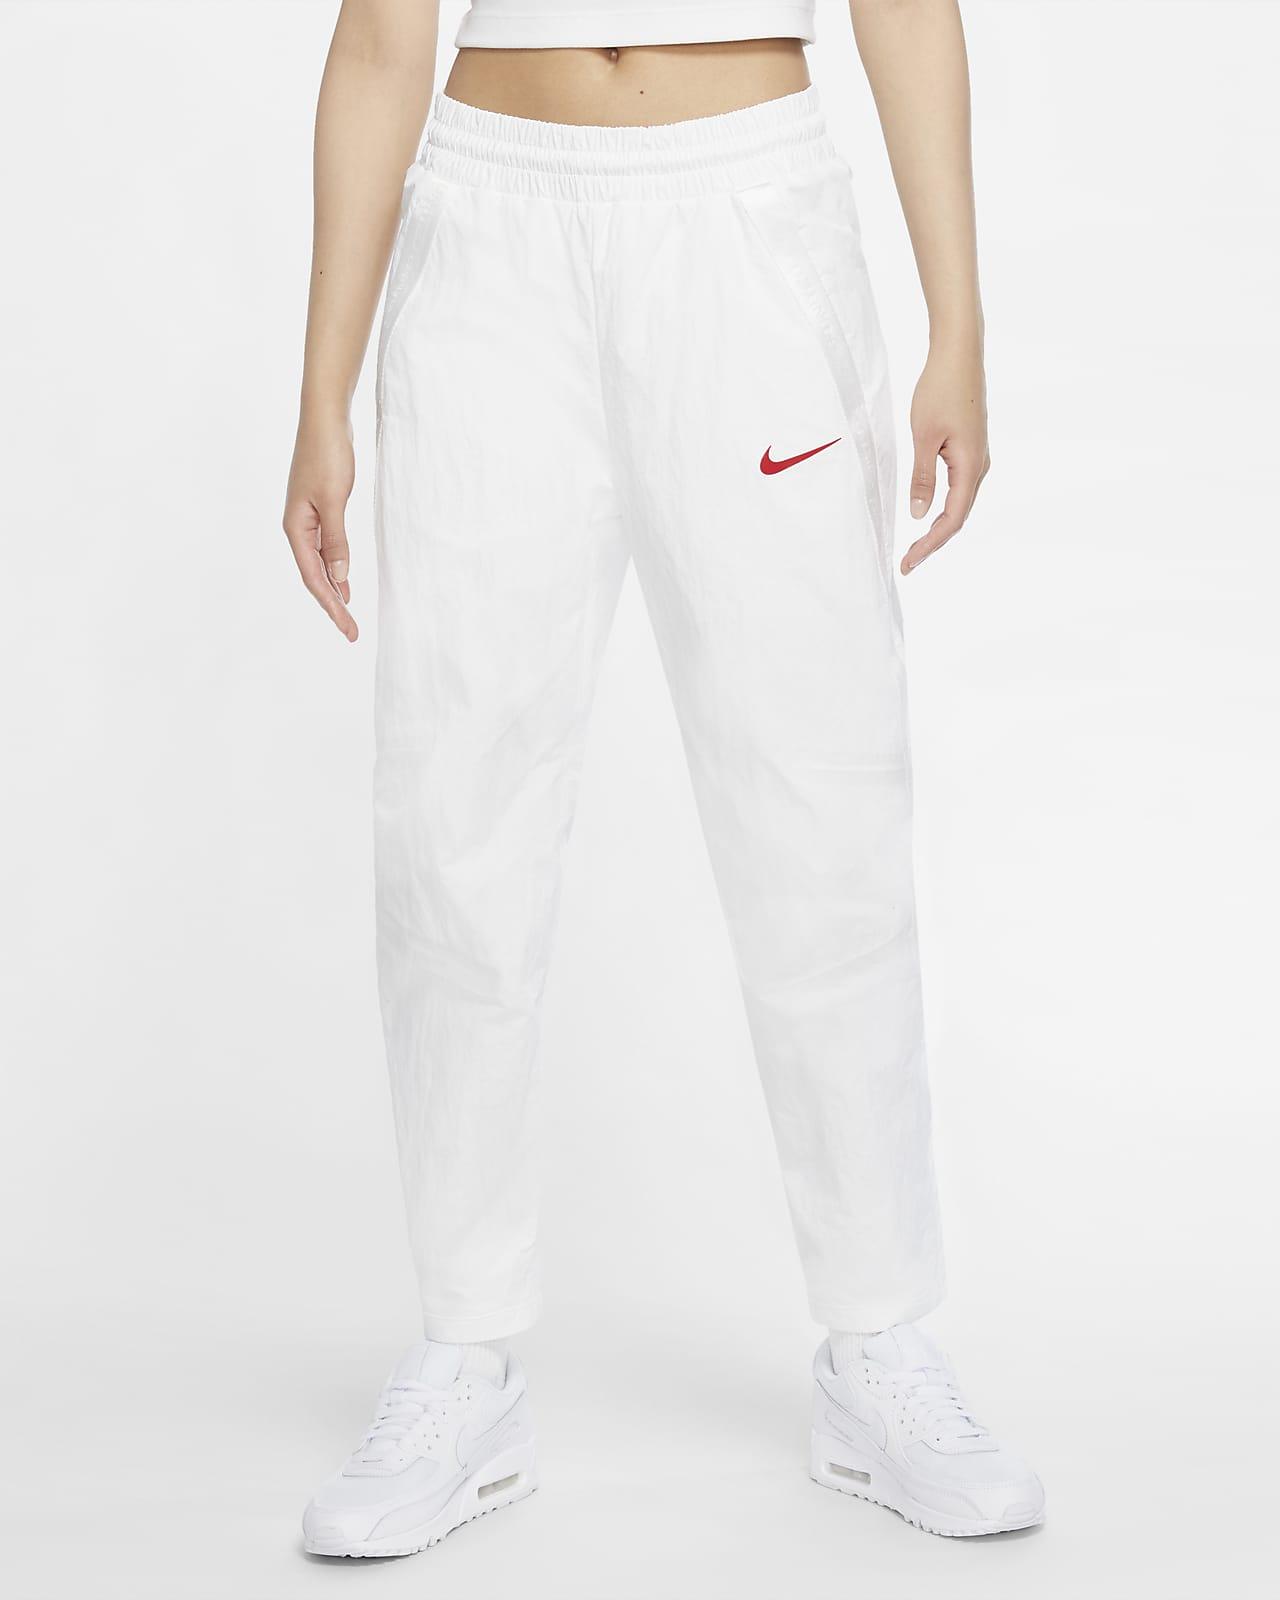 Nike Team USA Women's Medal Stand Pants